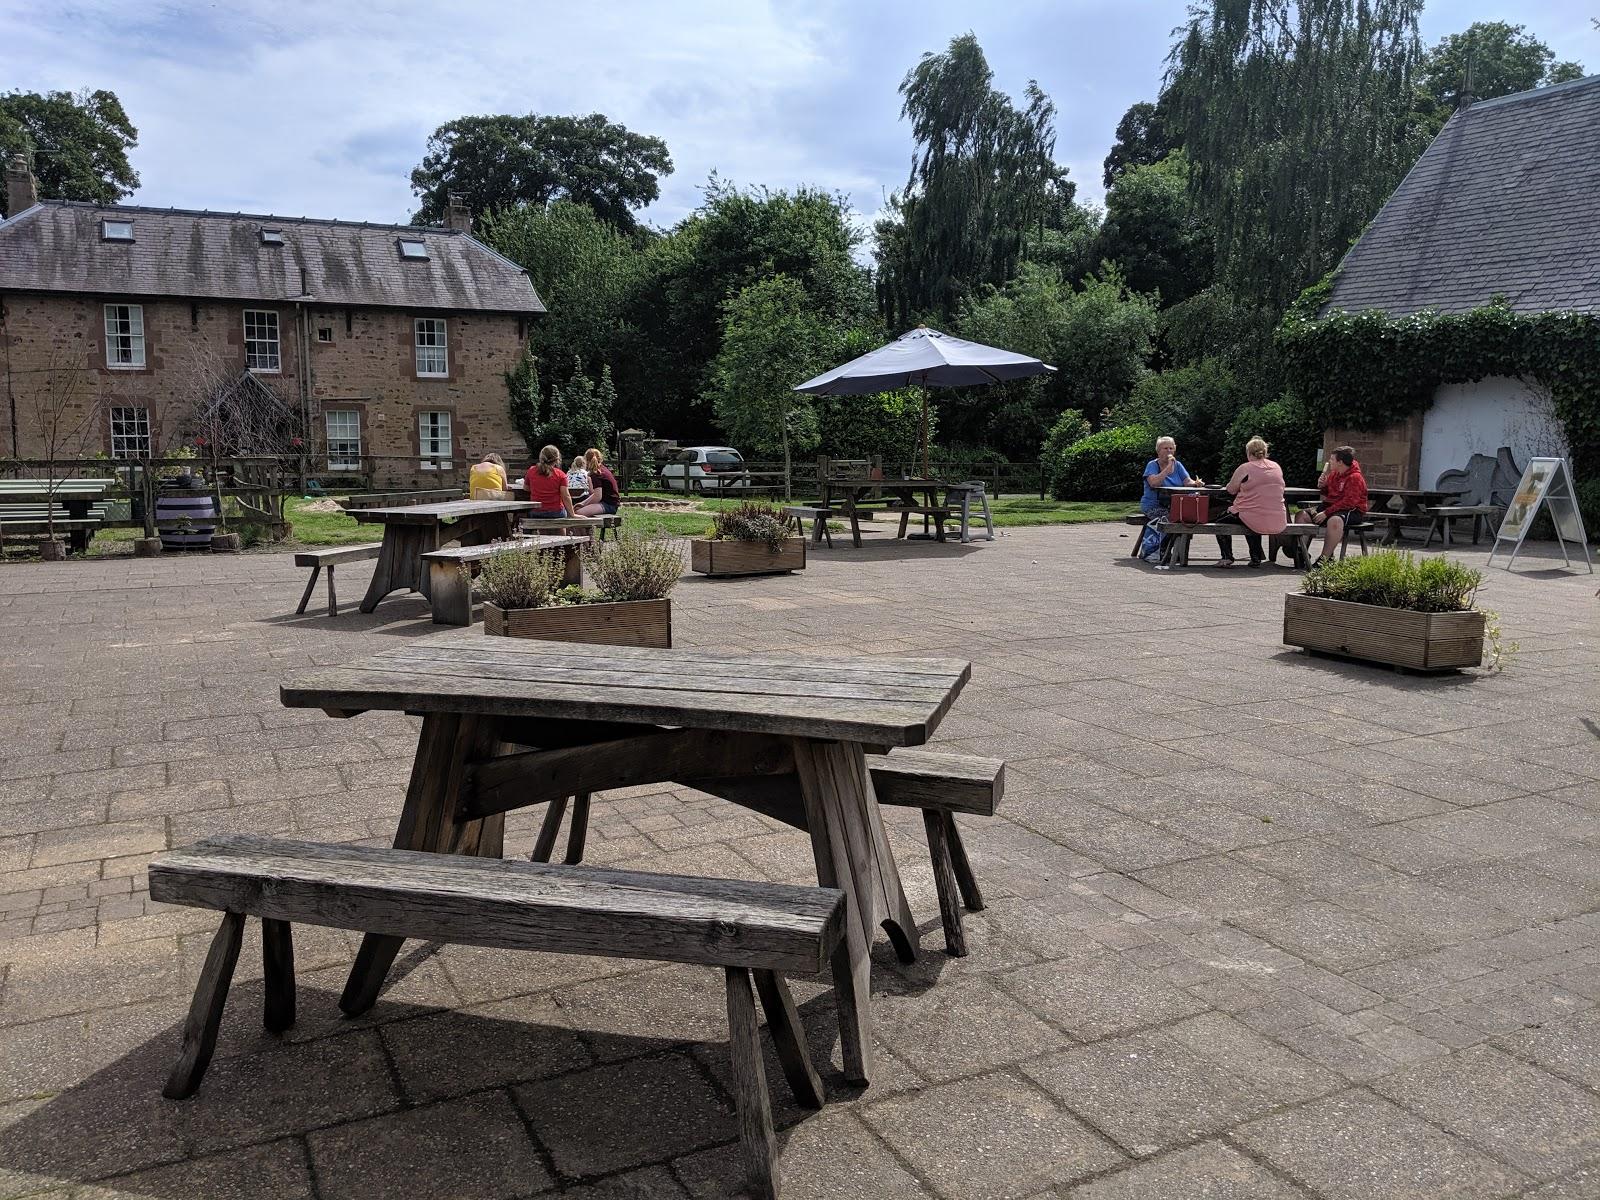 Harestanes Park, Jedburgh  - cafe garden